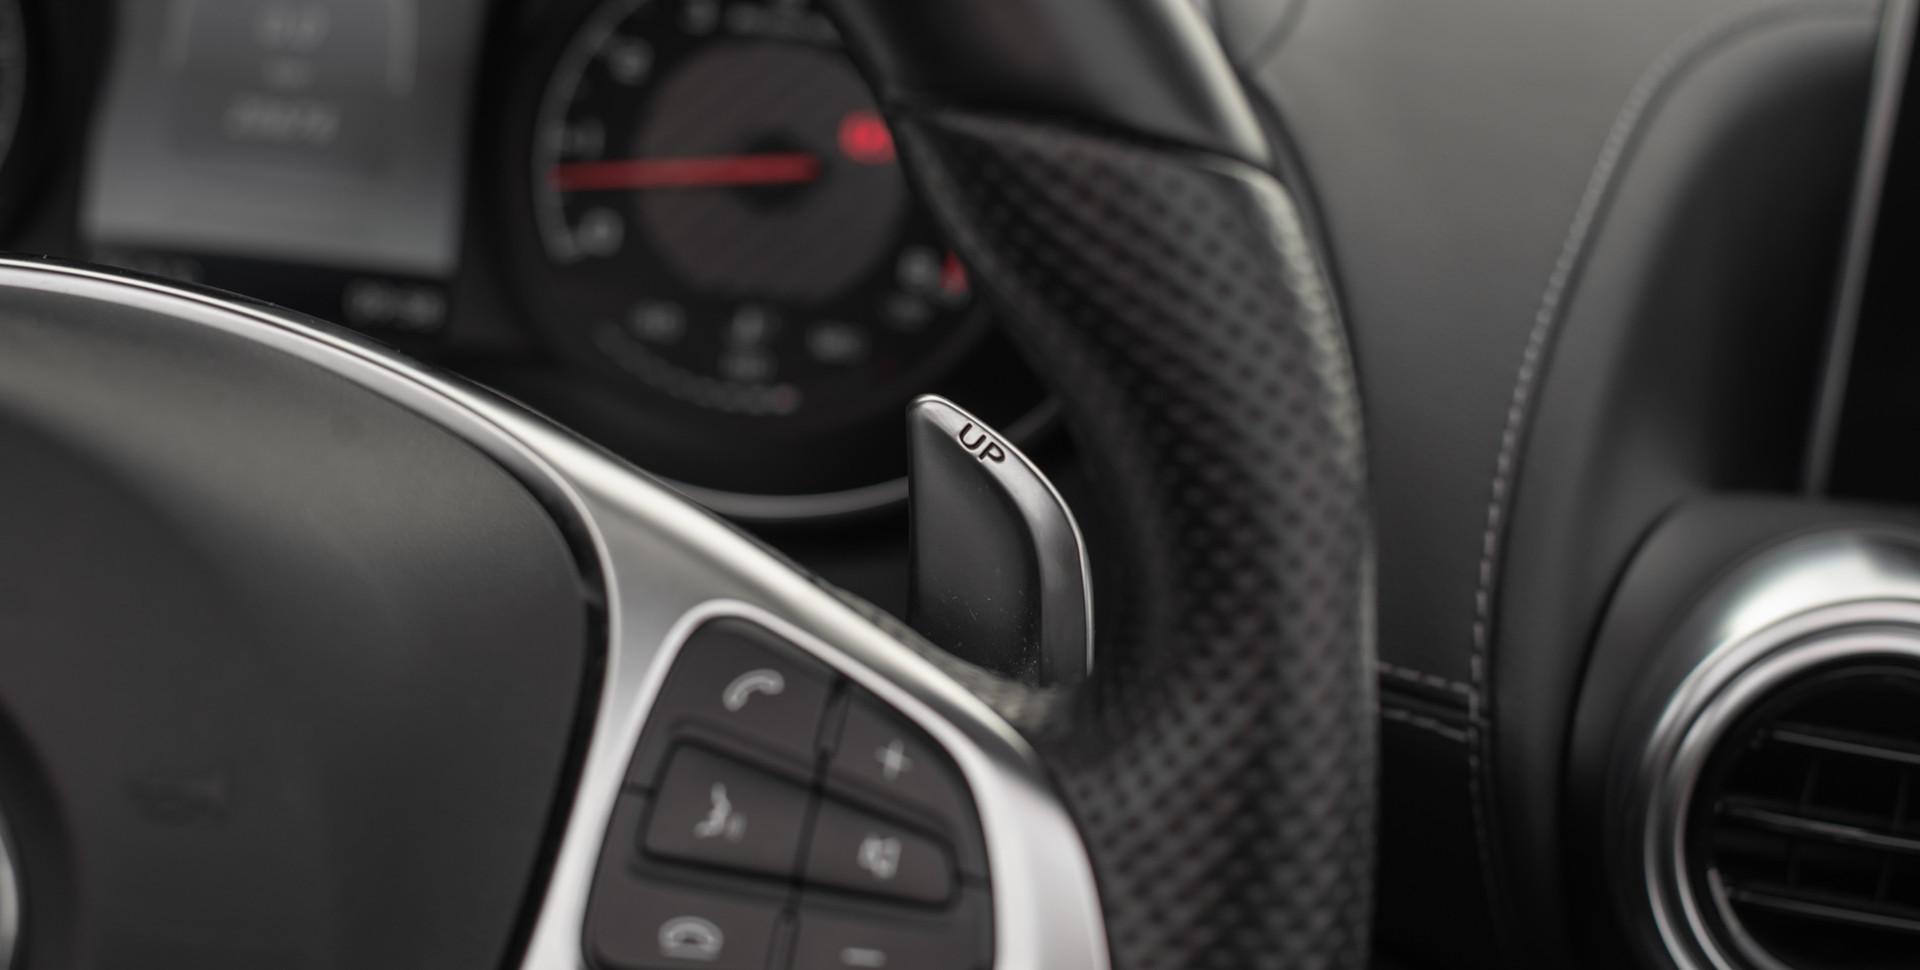 MB AMG GT Cabrio-22.jpg.JPG